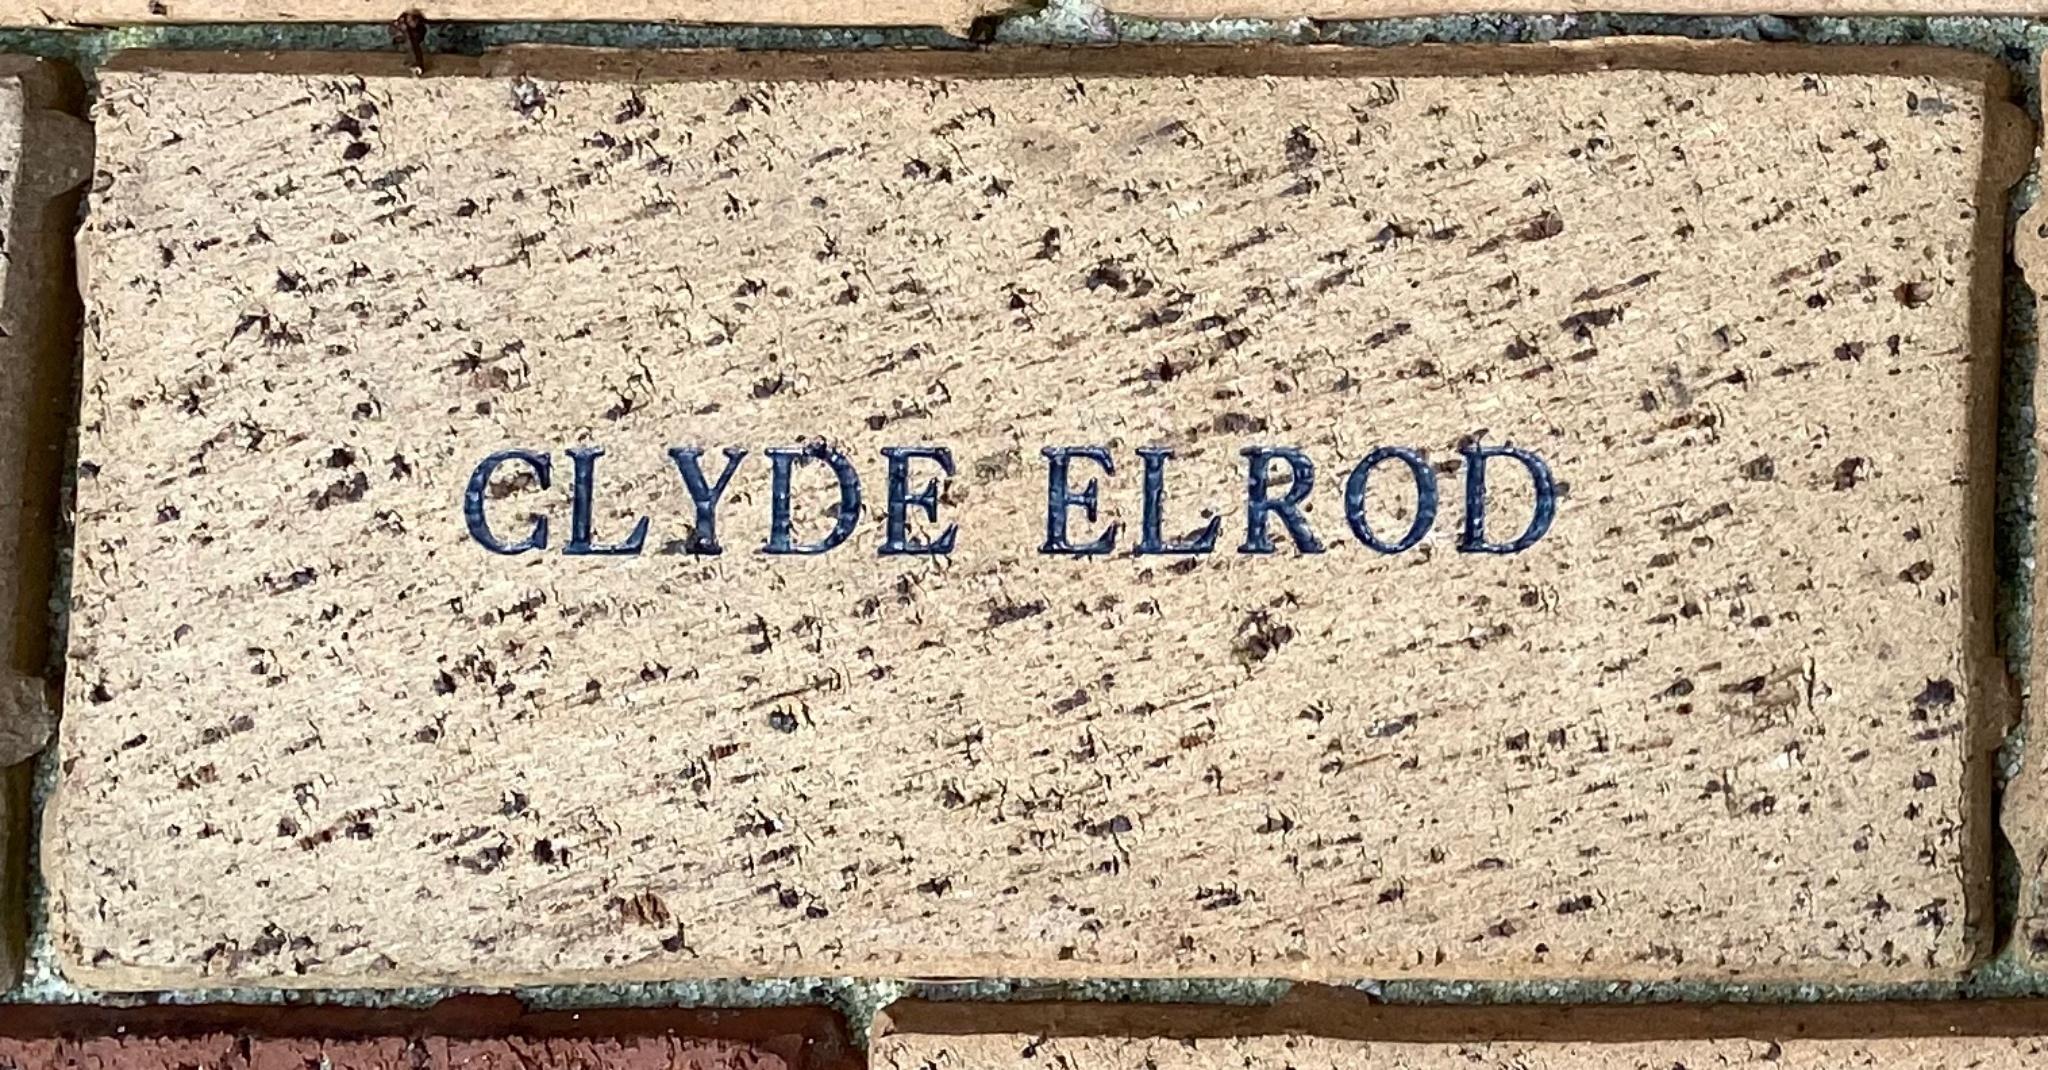 CLYDE ELROD